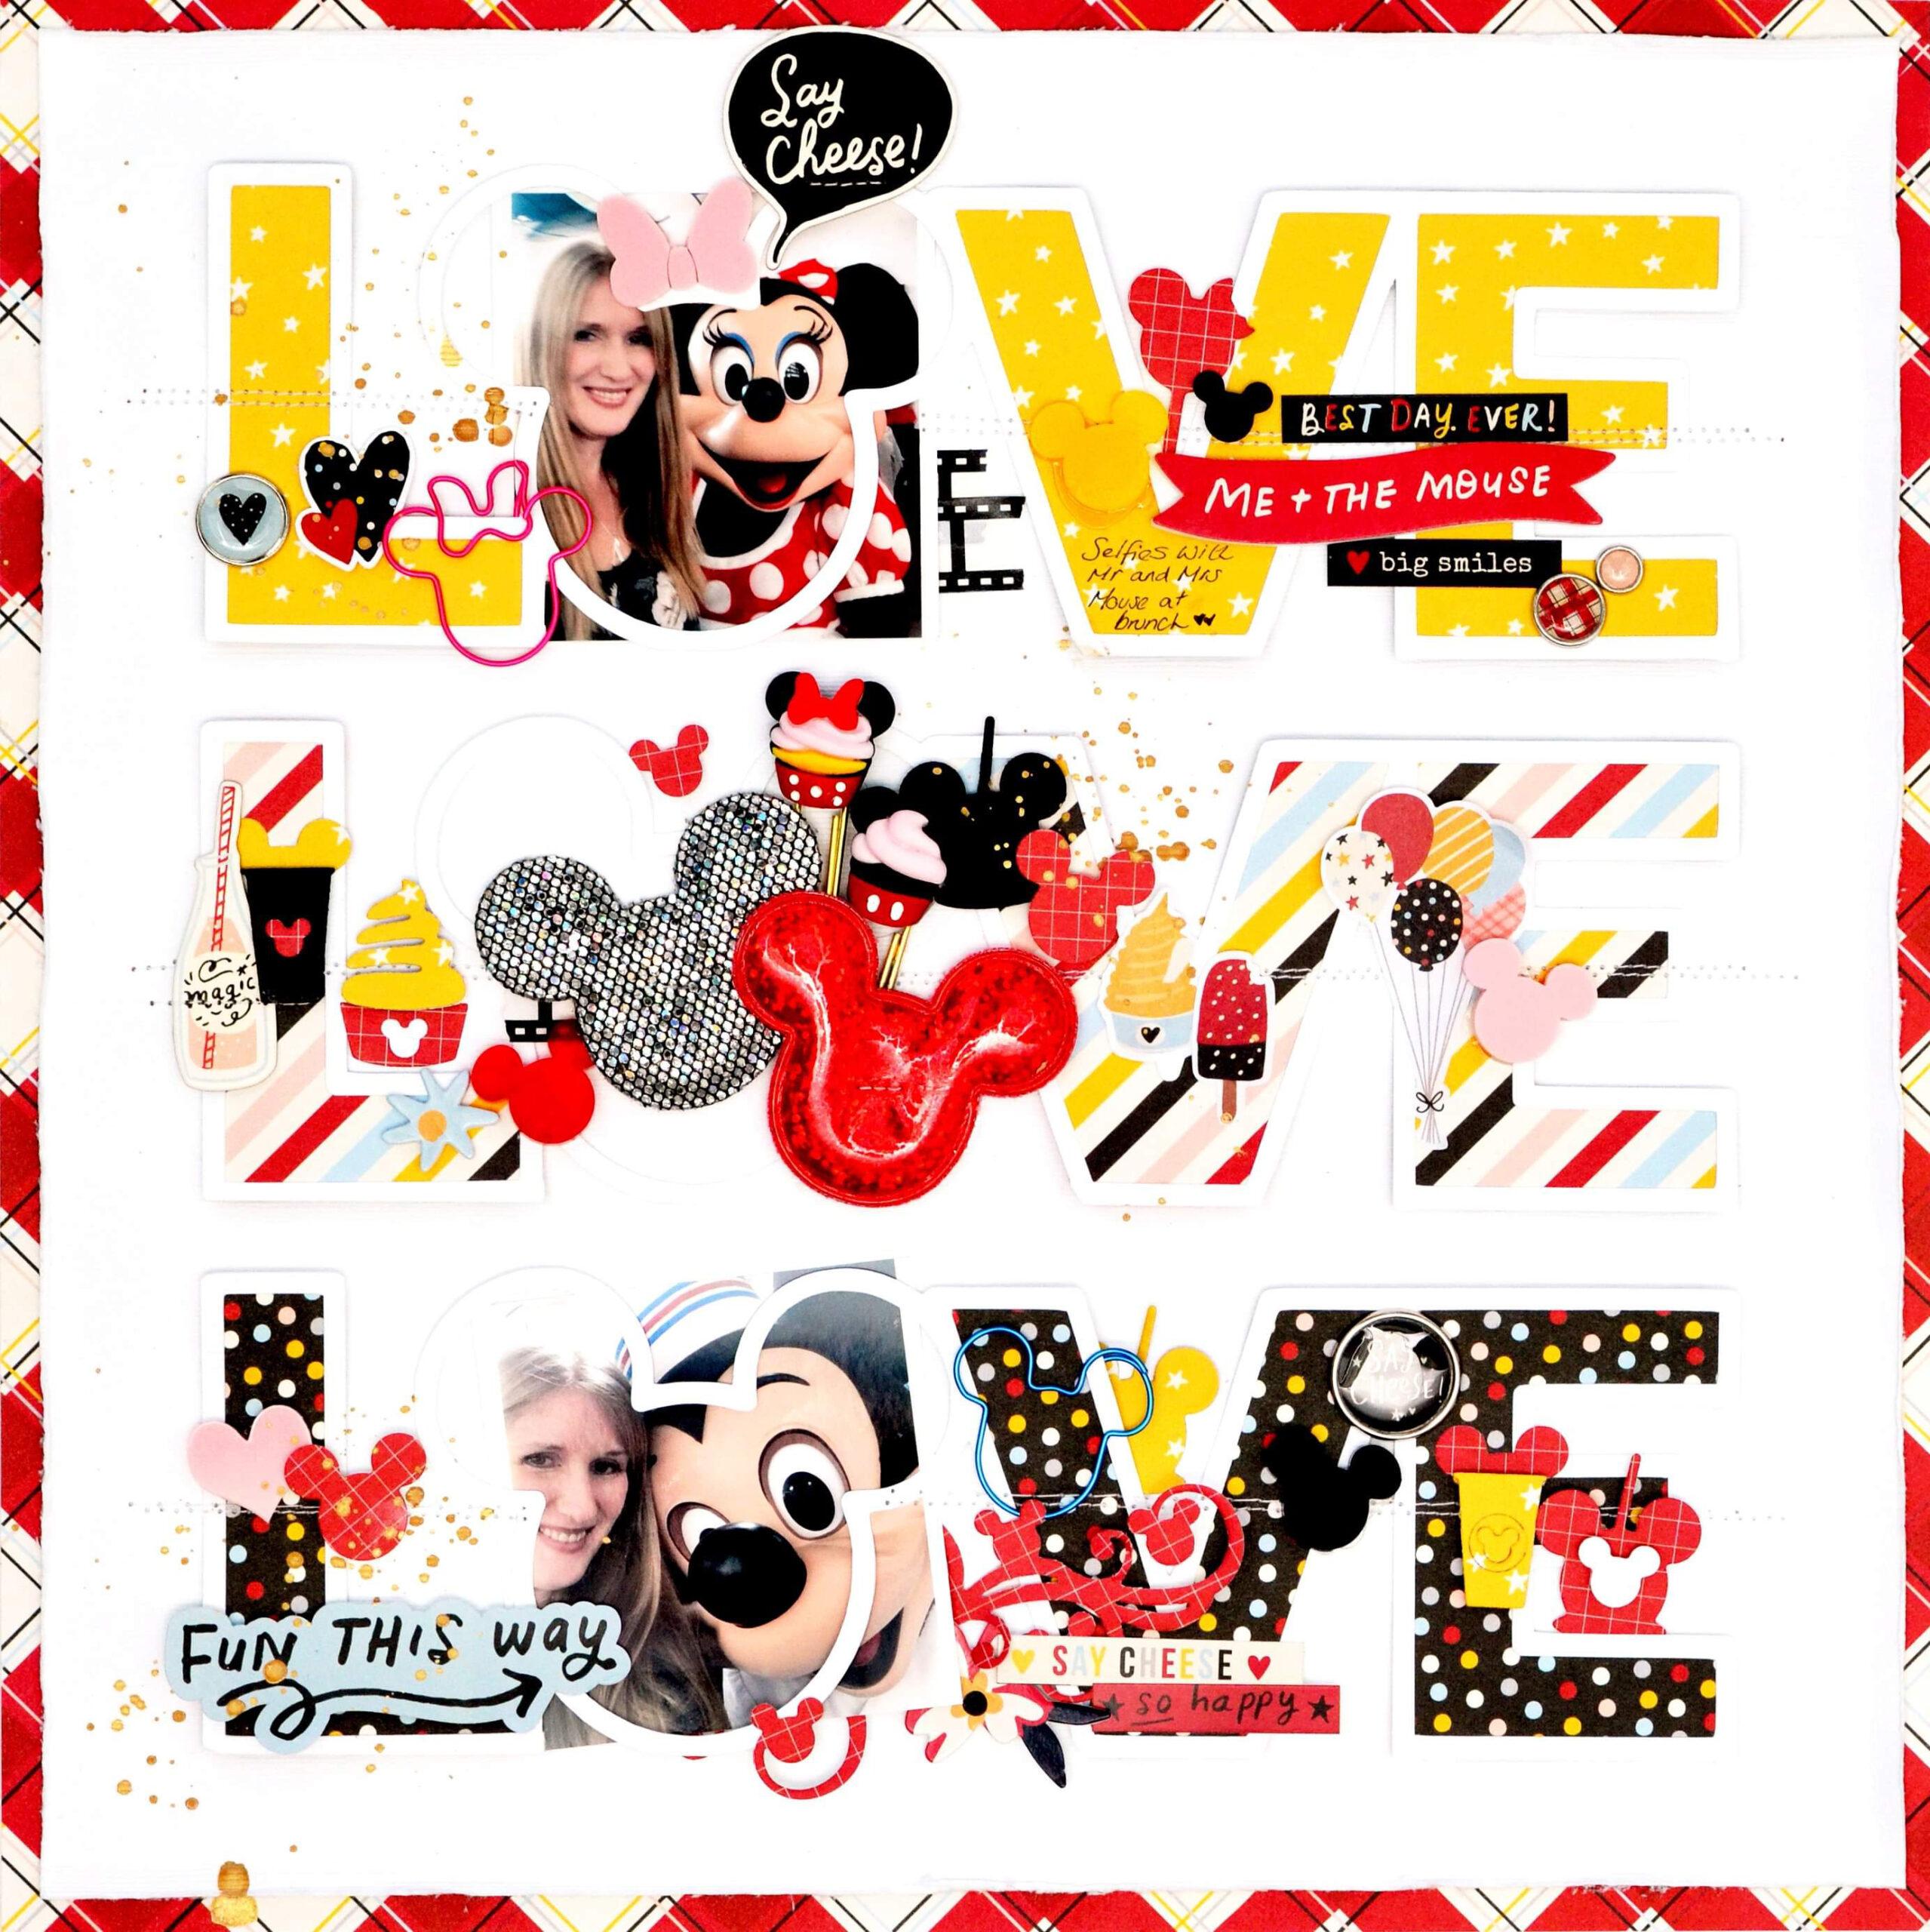 Love 1 image